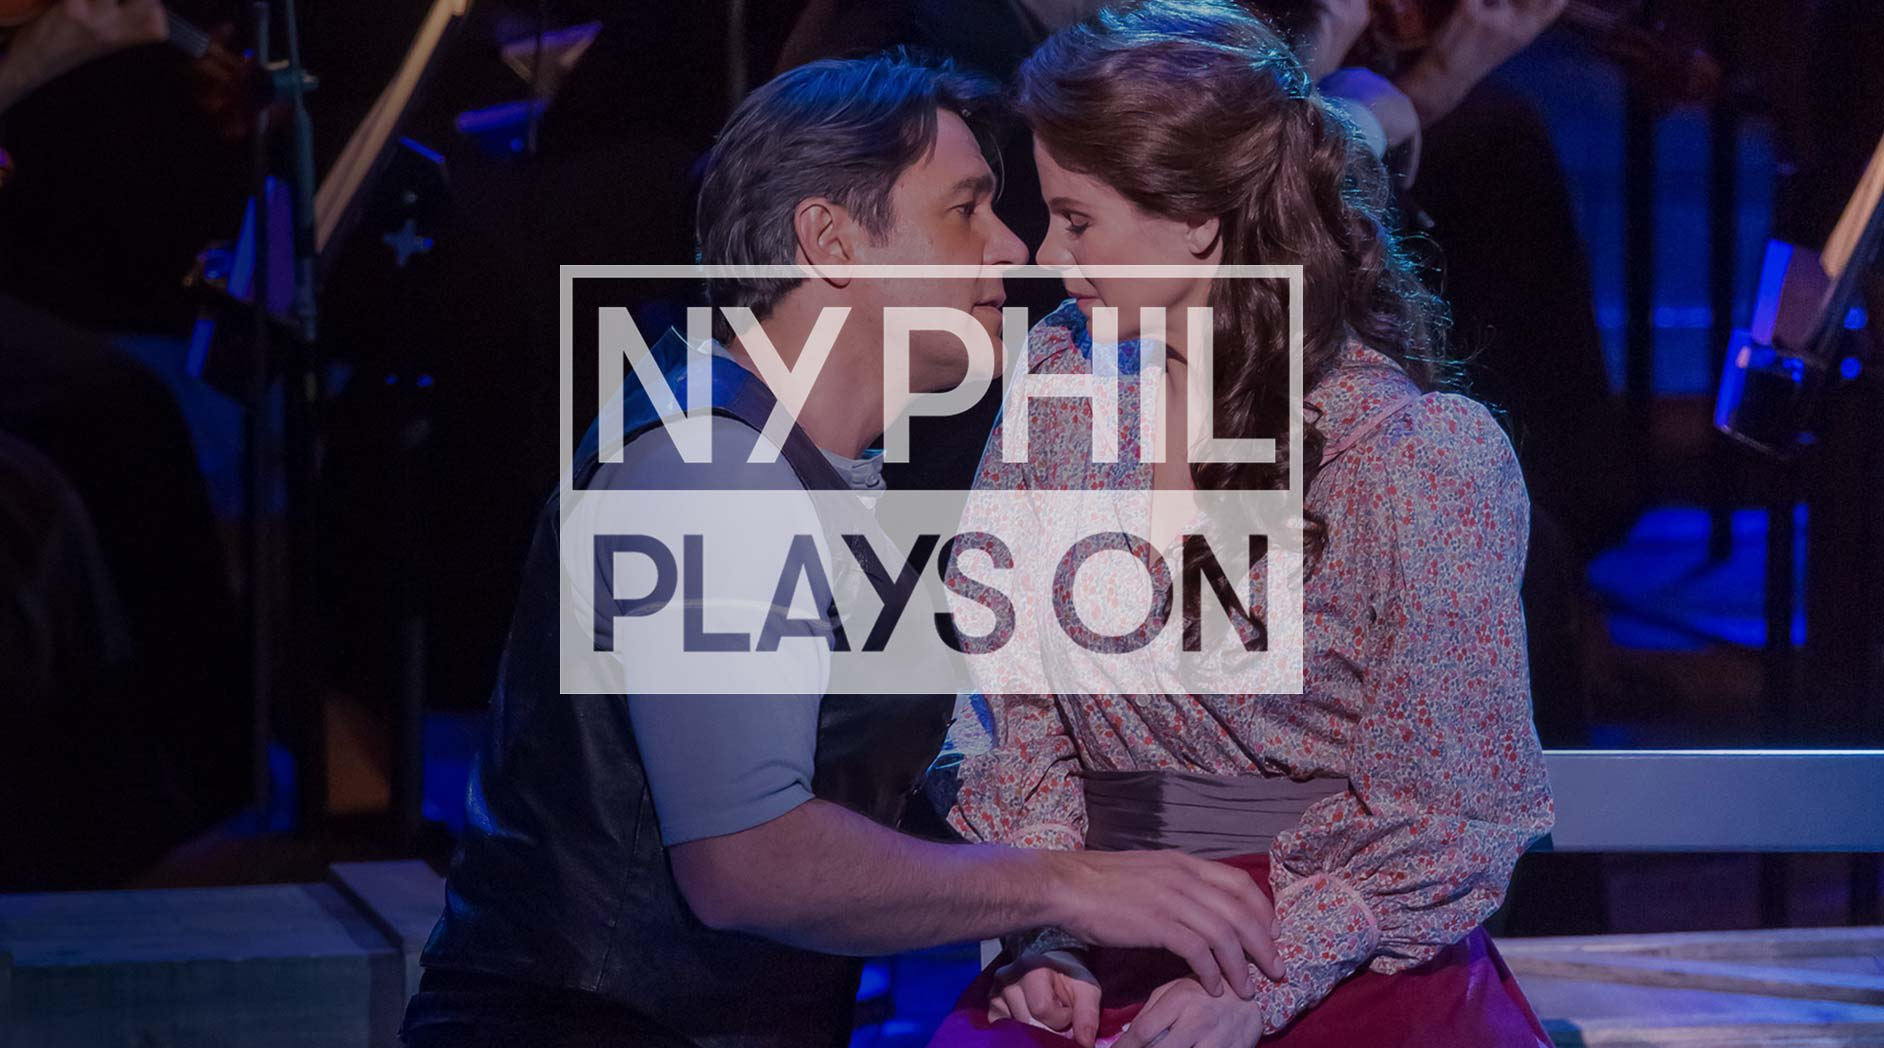 <em>NY Phil Plays On:</em> Rodgers and Hammerstein's <em>Carousel</em>